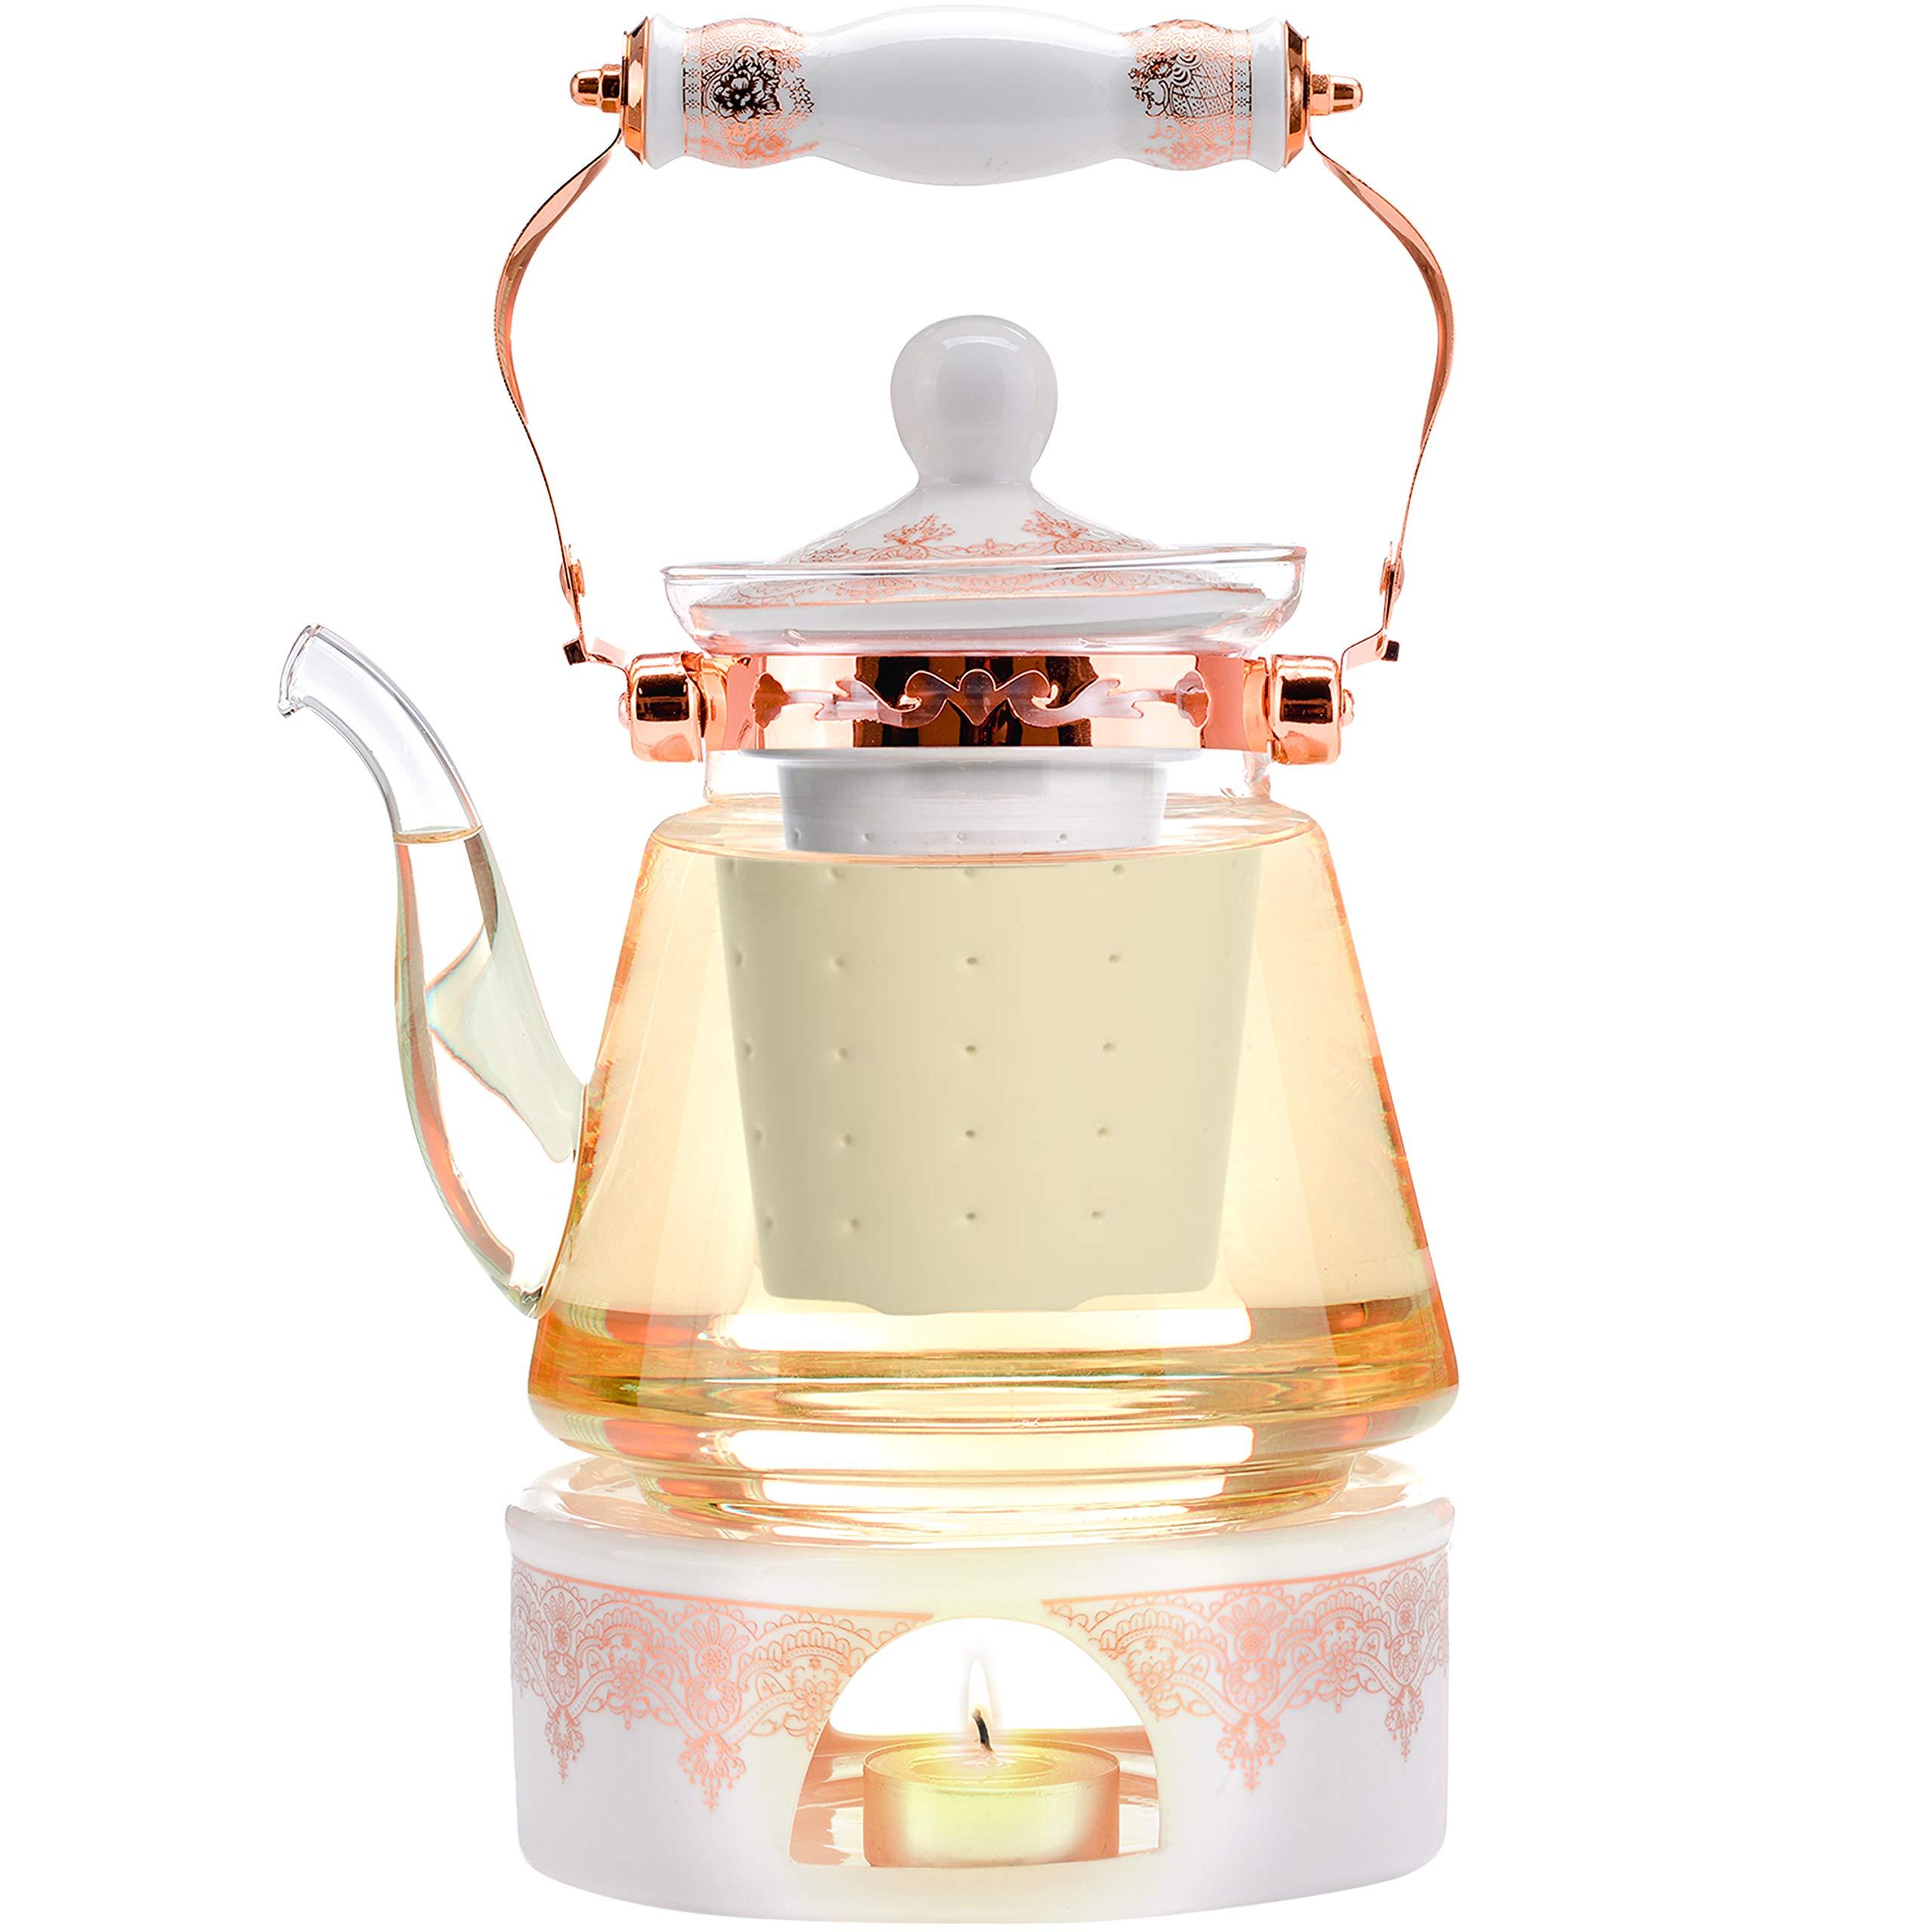 Kuhn Rikon 2080 Swiss Energysaver 2080 Cookware Accessories Gas Flame Protector 28 cm